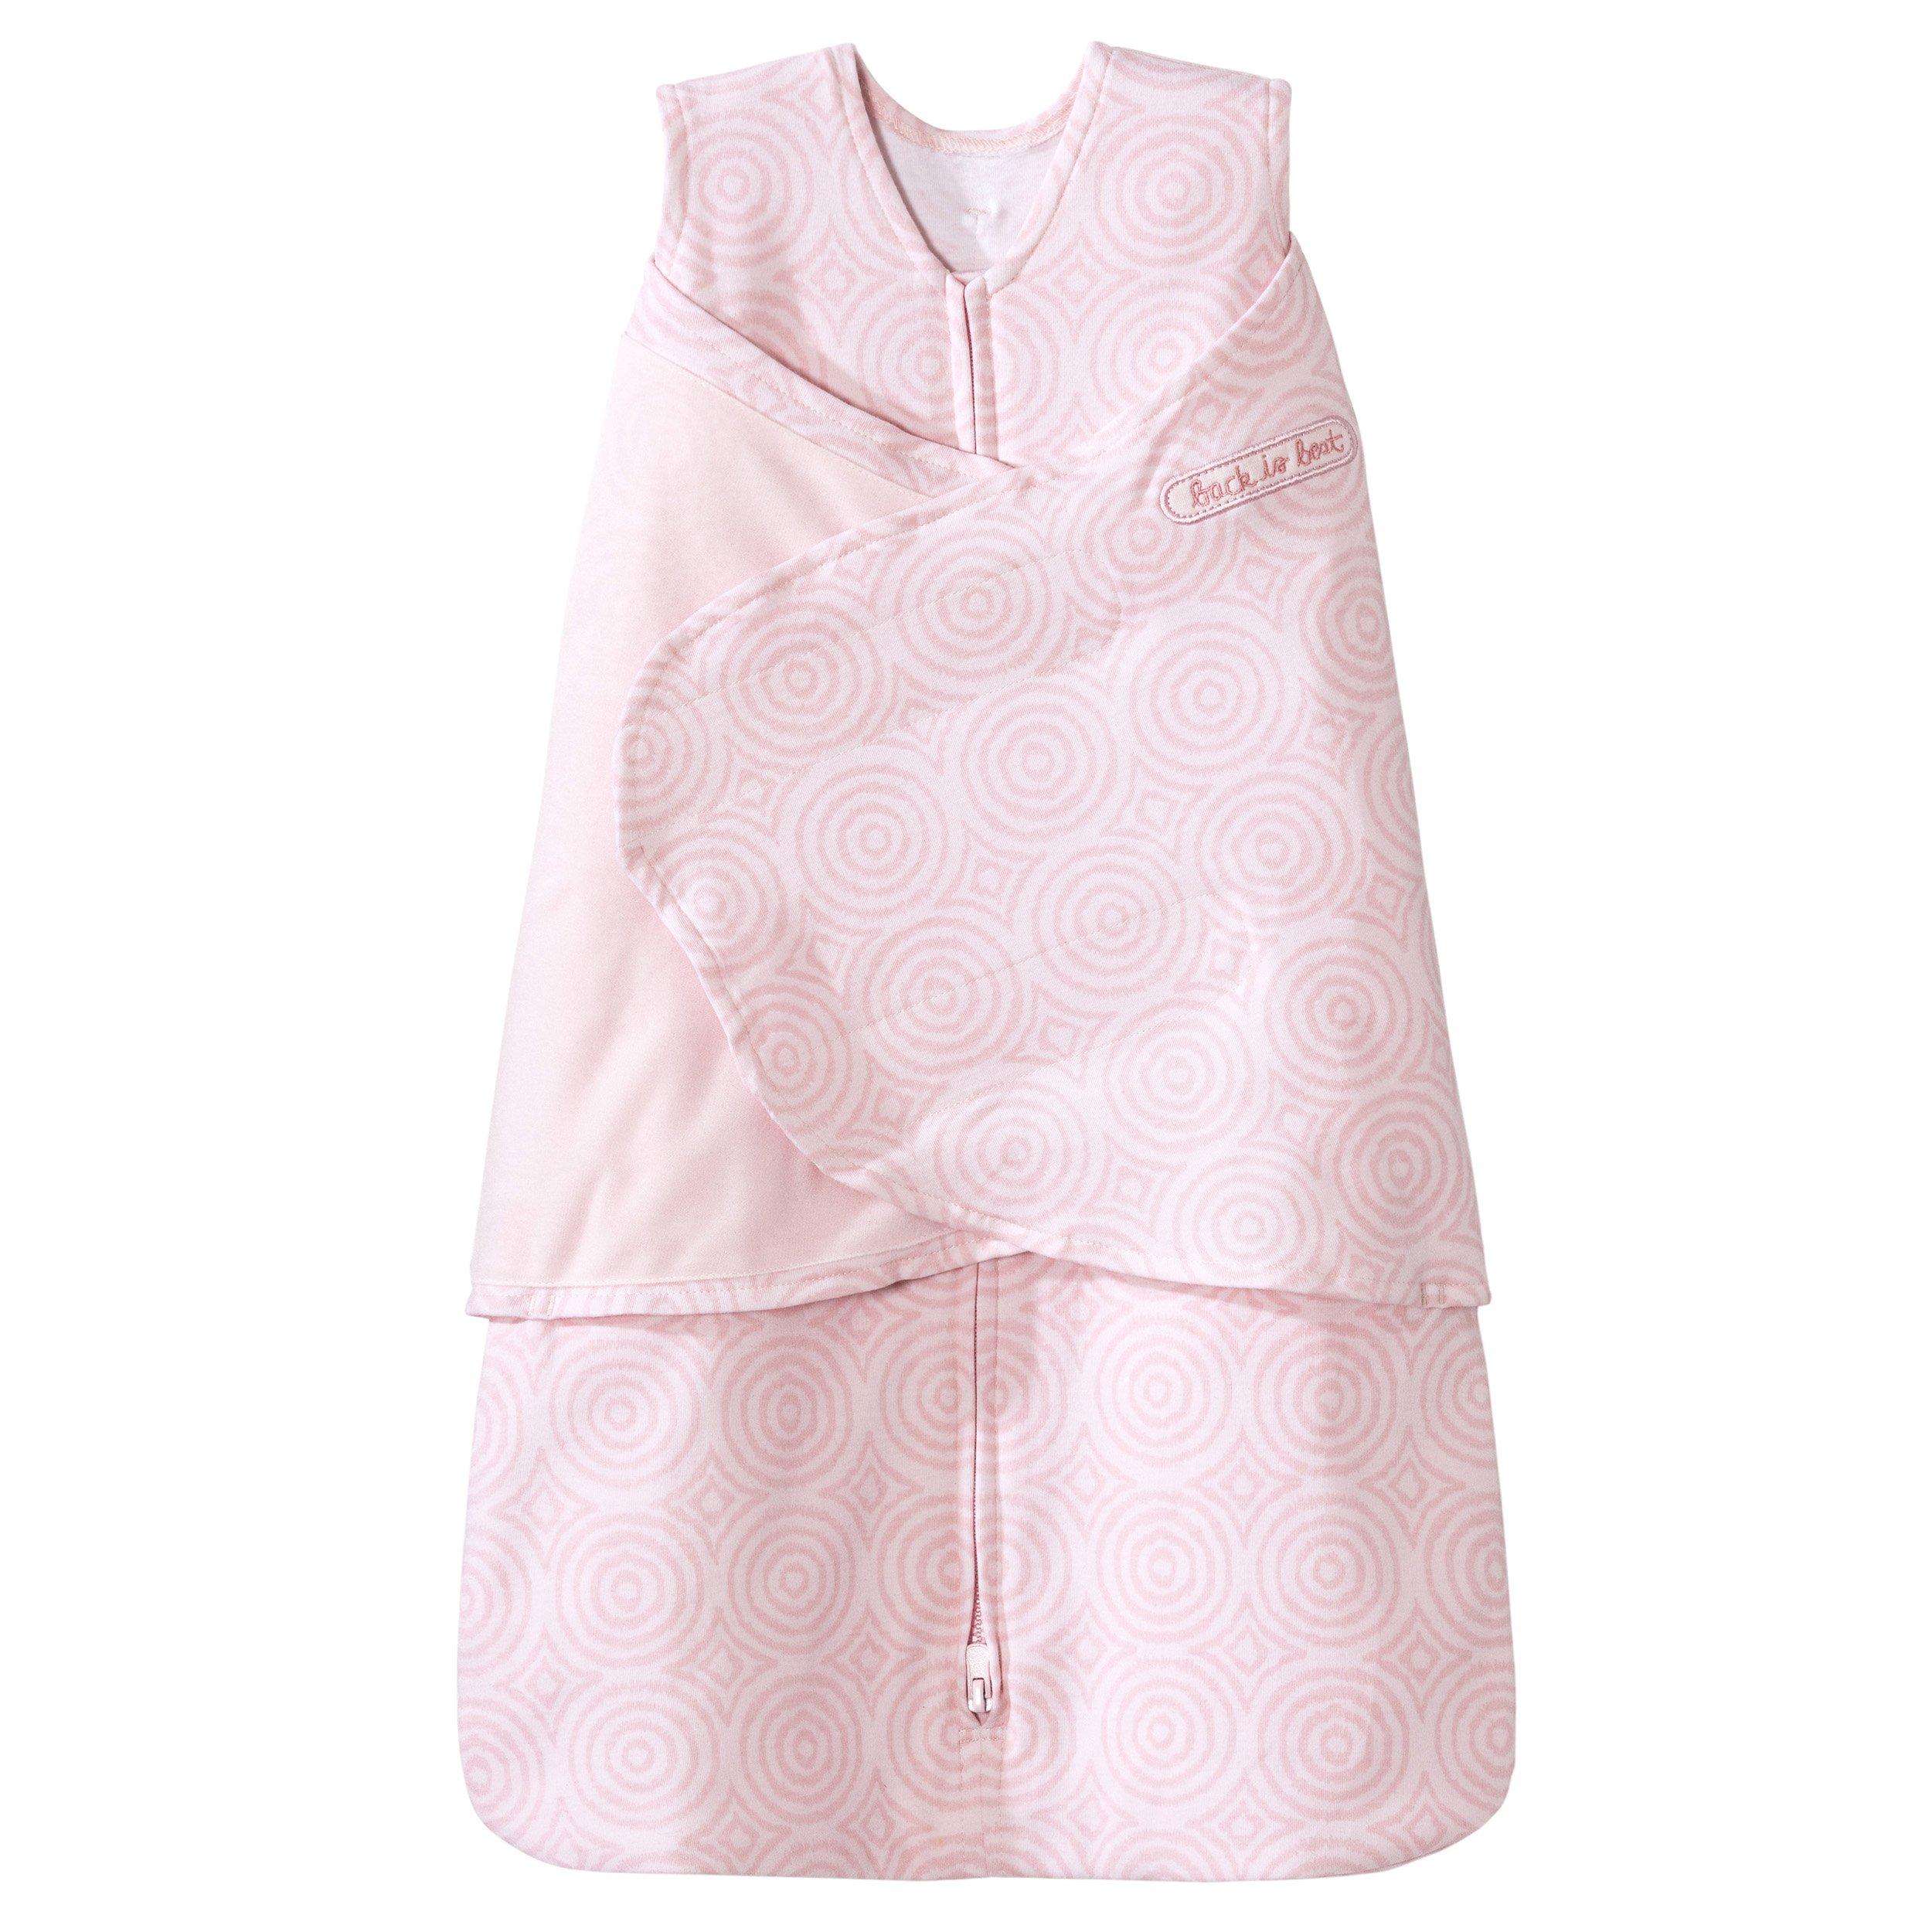 ce5d6a0731 Amazon.com  HALO 100% Cotton Sleepsack Swaddle Wearable Blanket ...